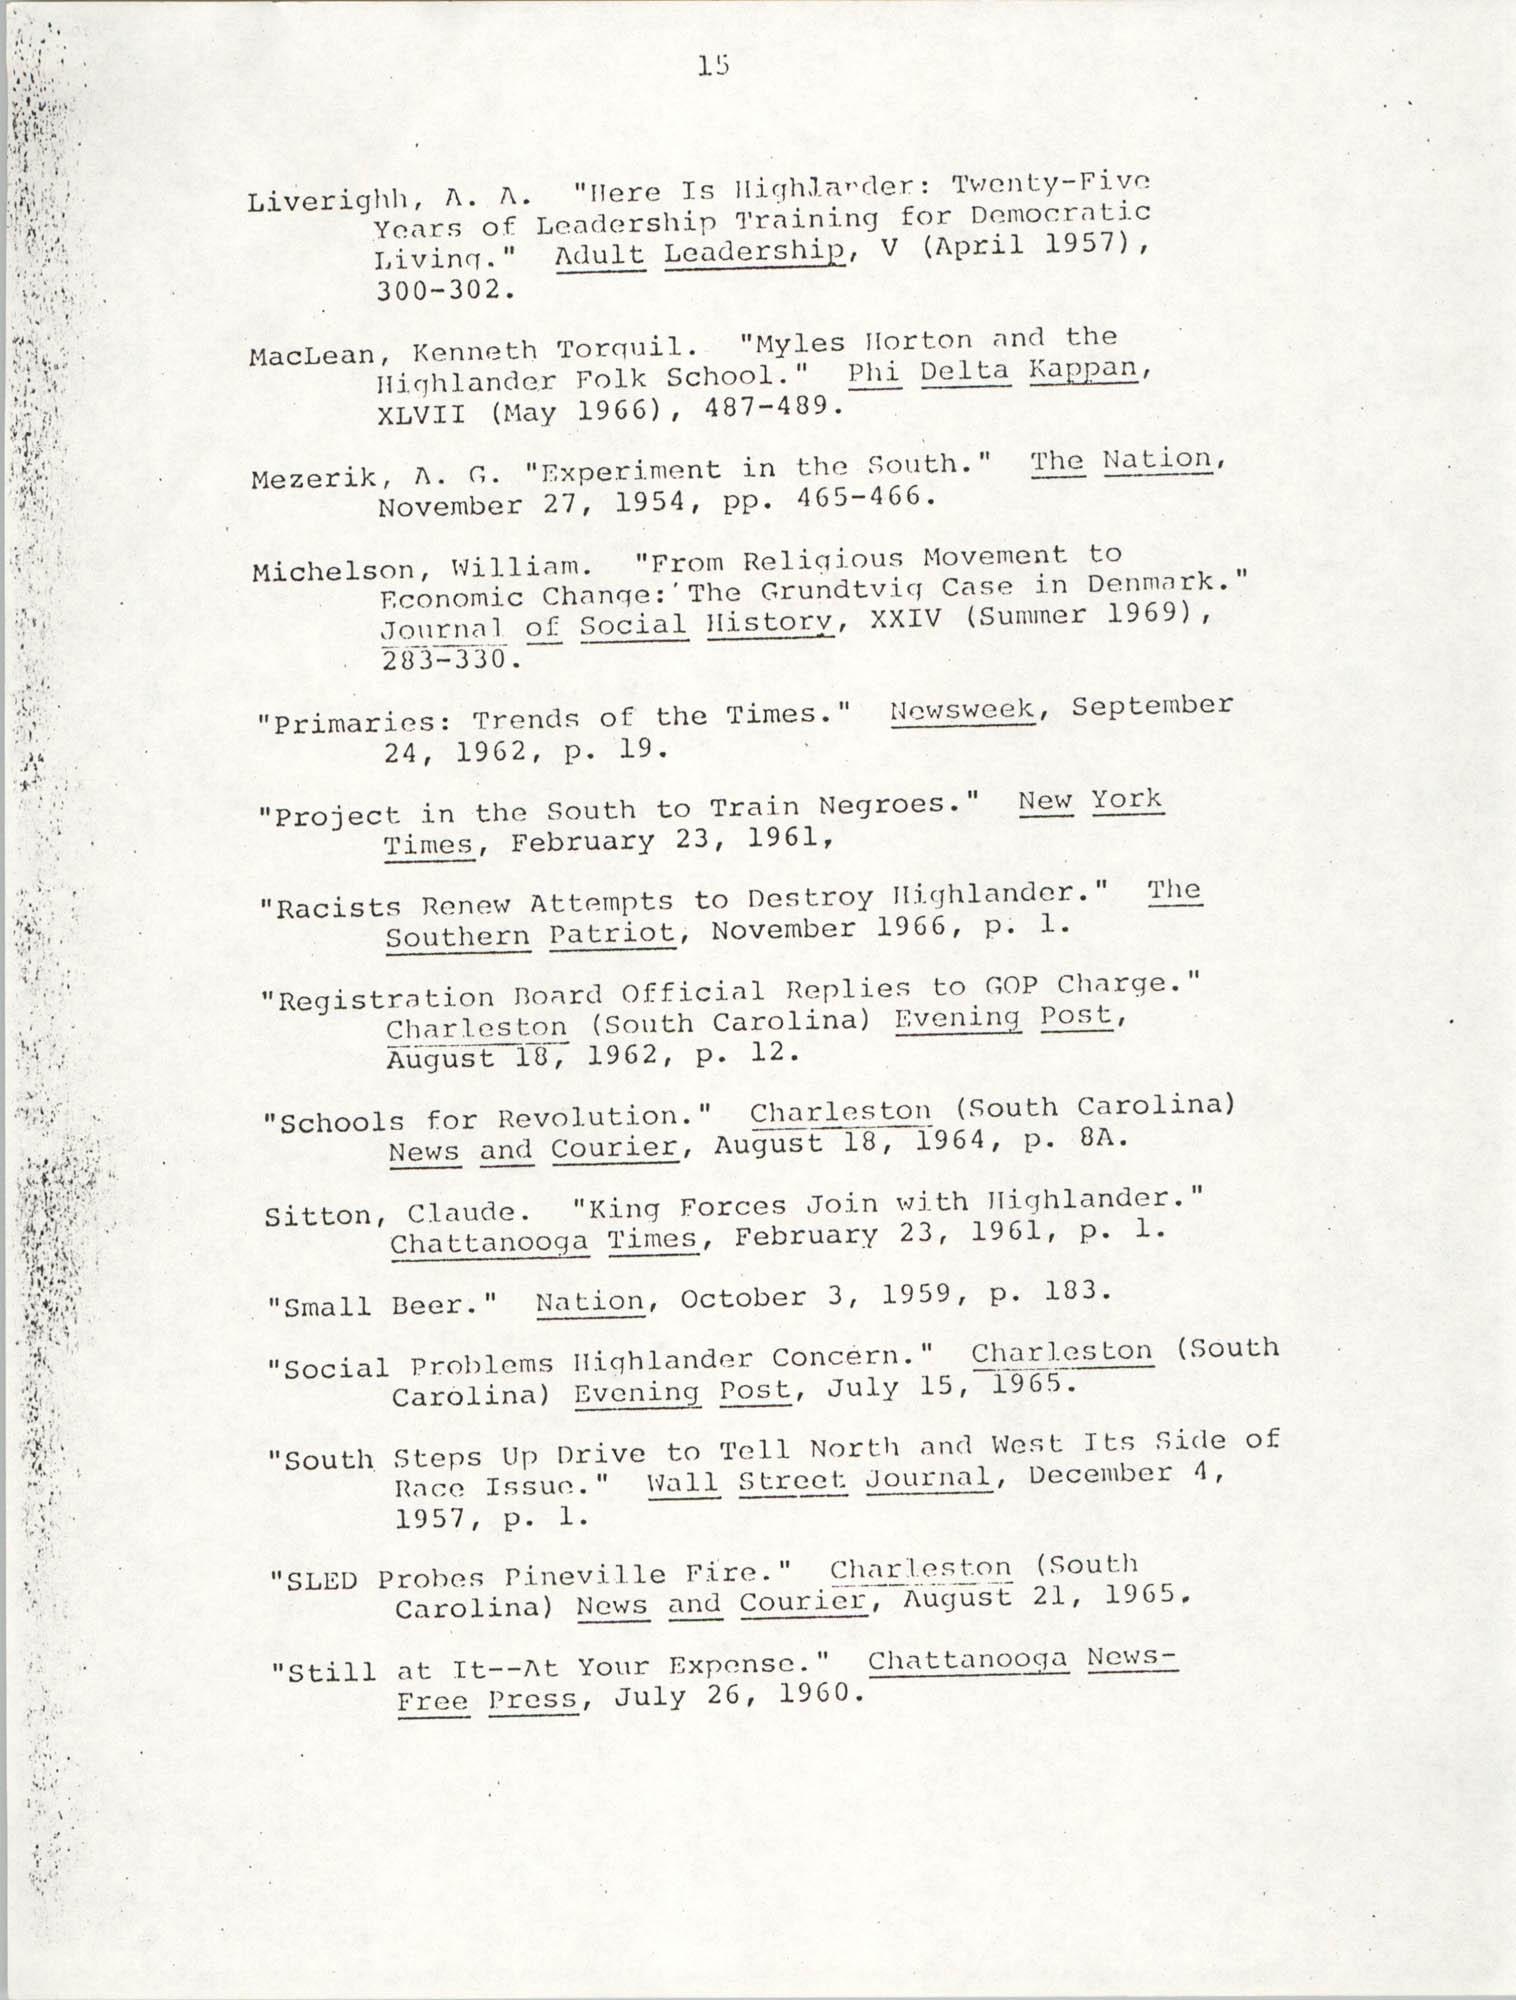 Dissertation Proposal, Page 15